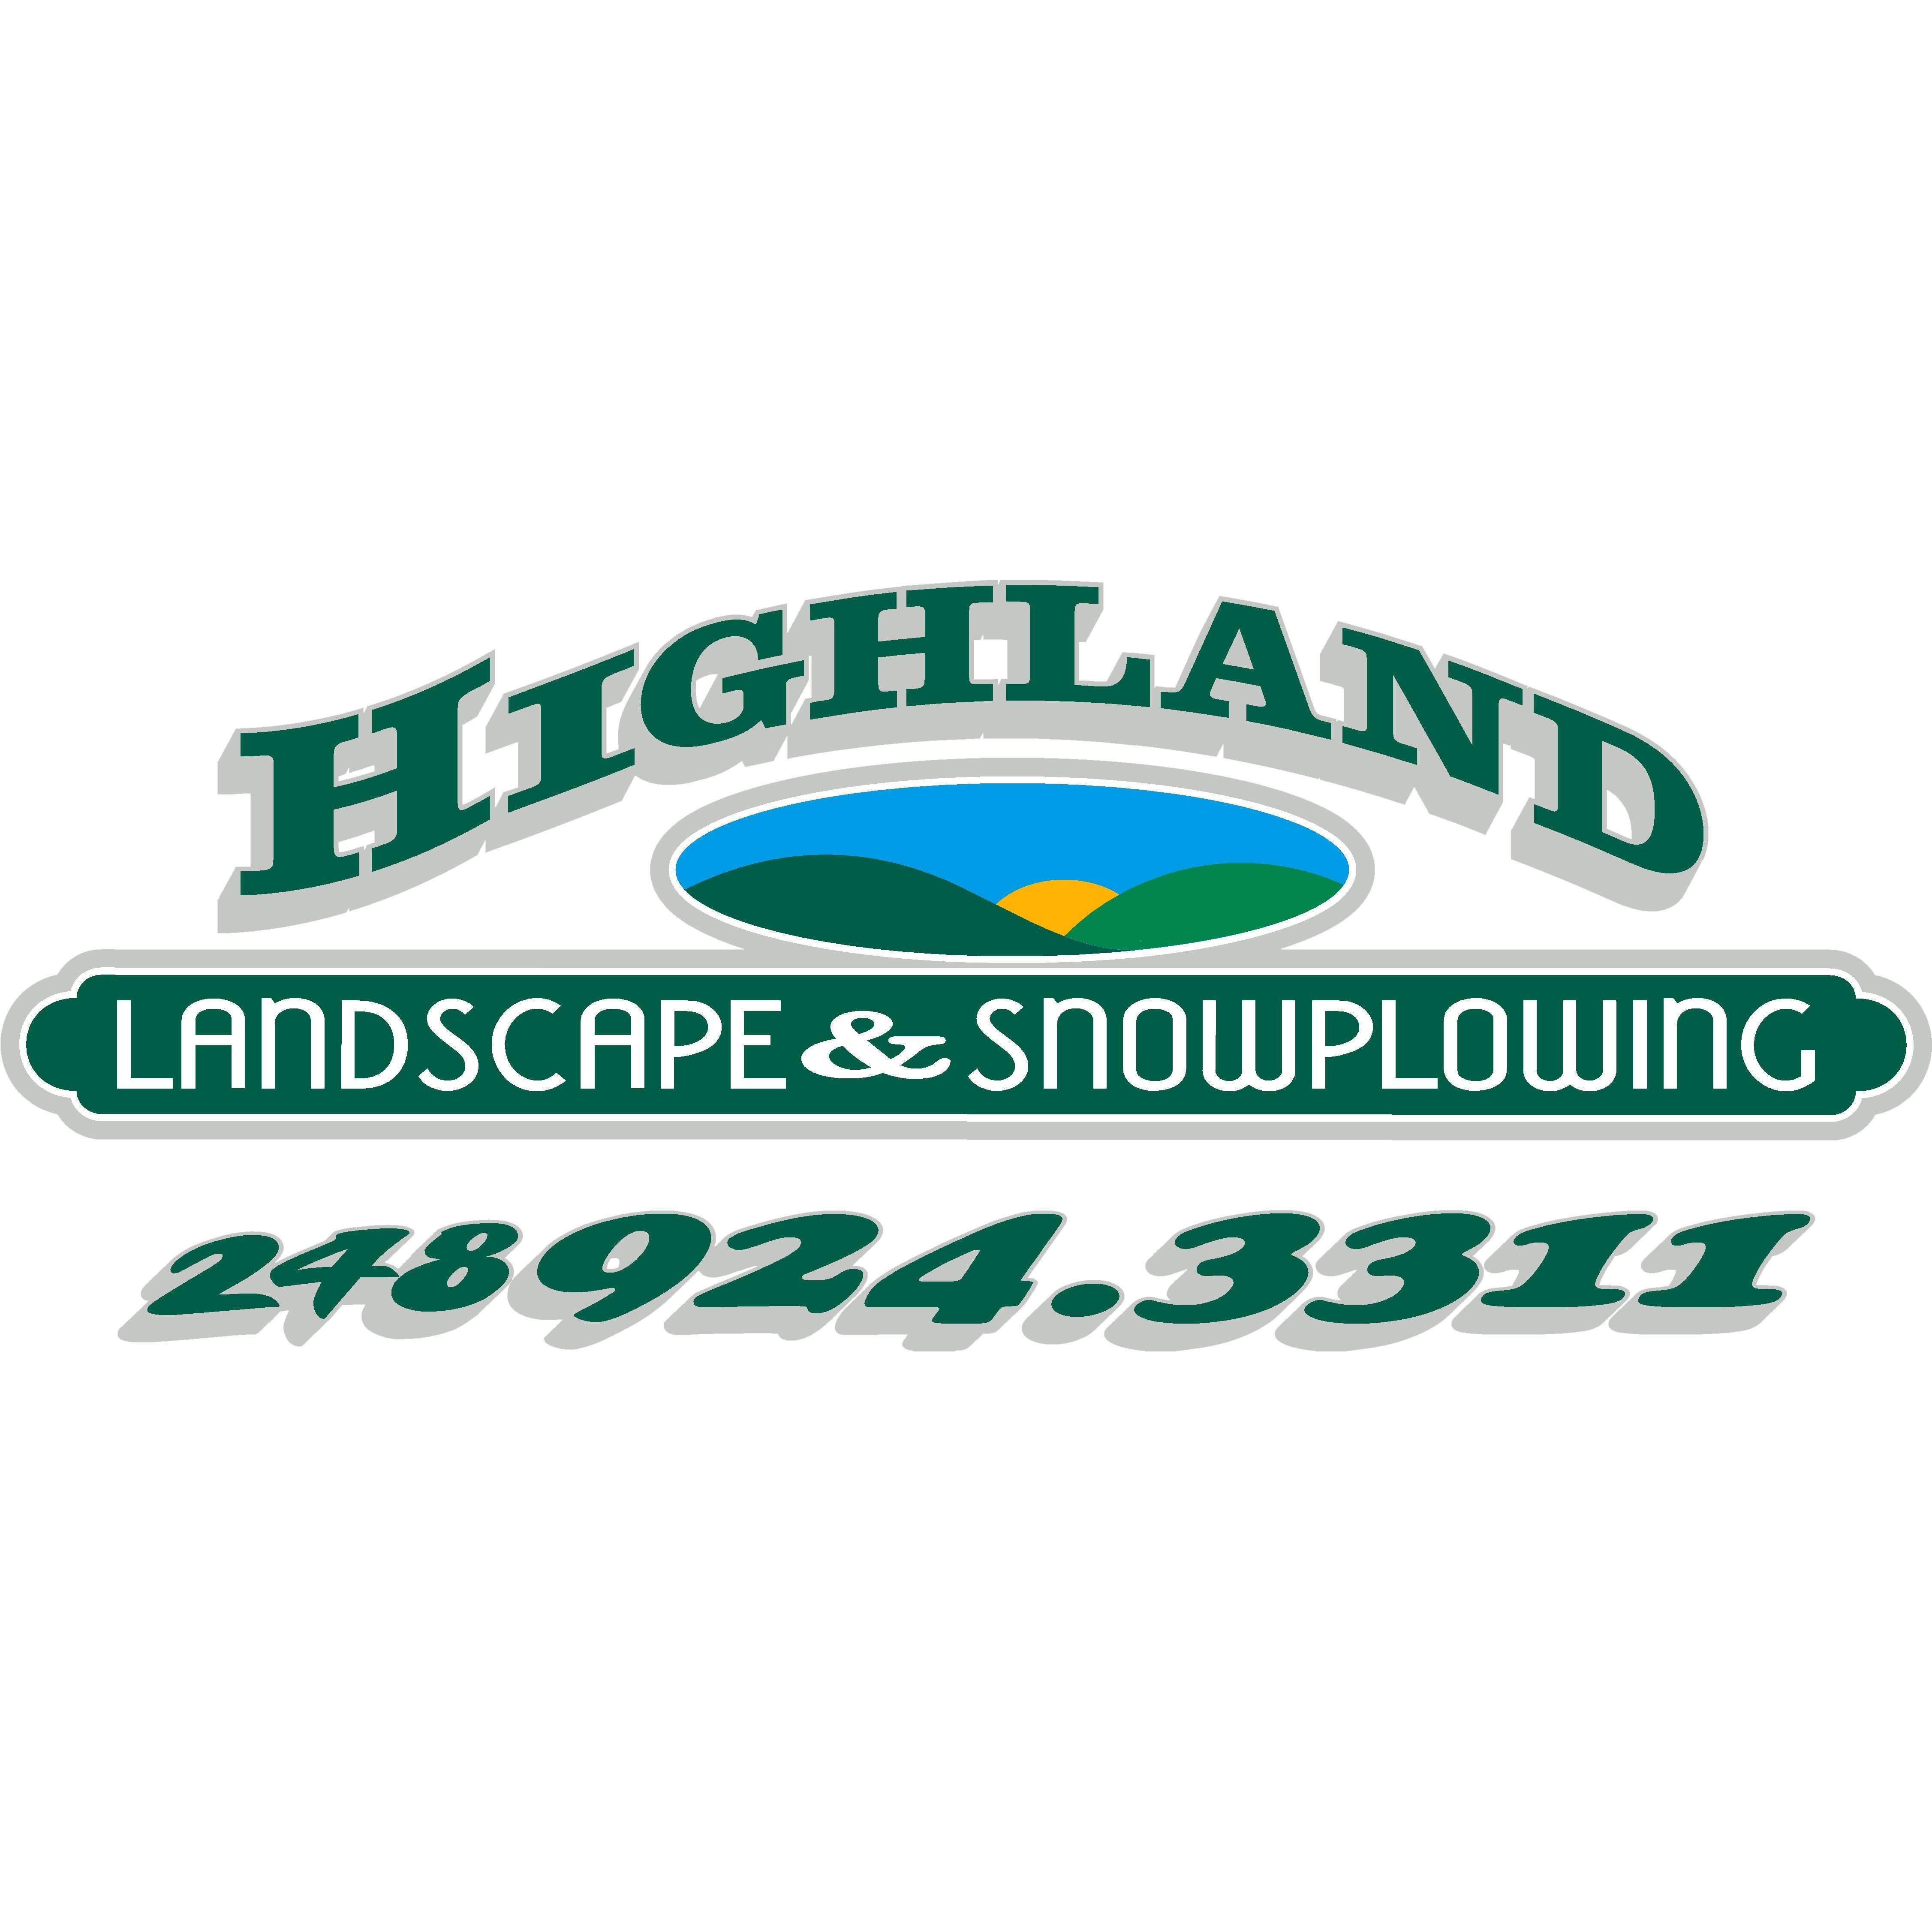 Highland Landscaping & Snowplowing